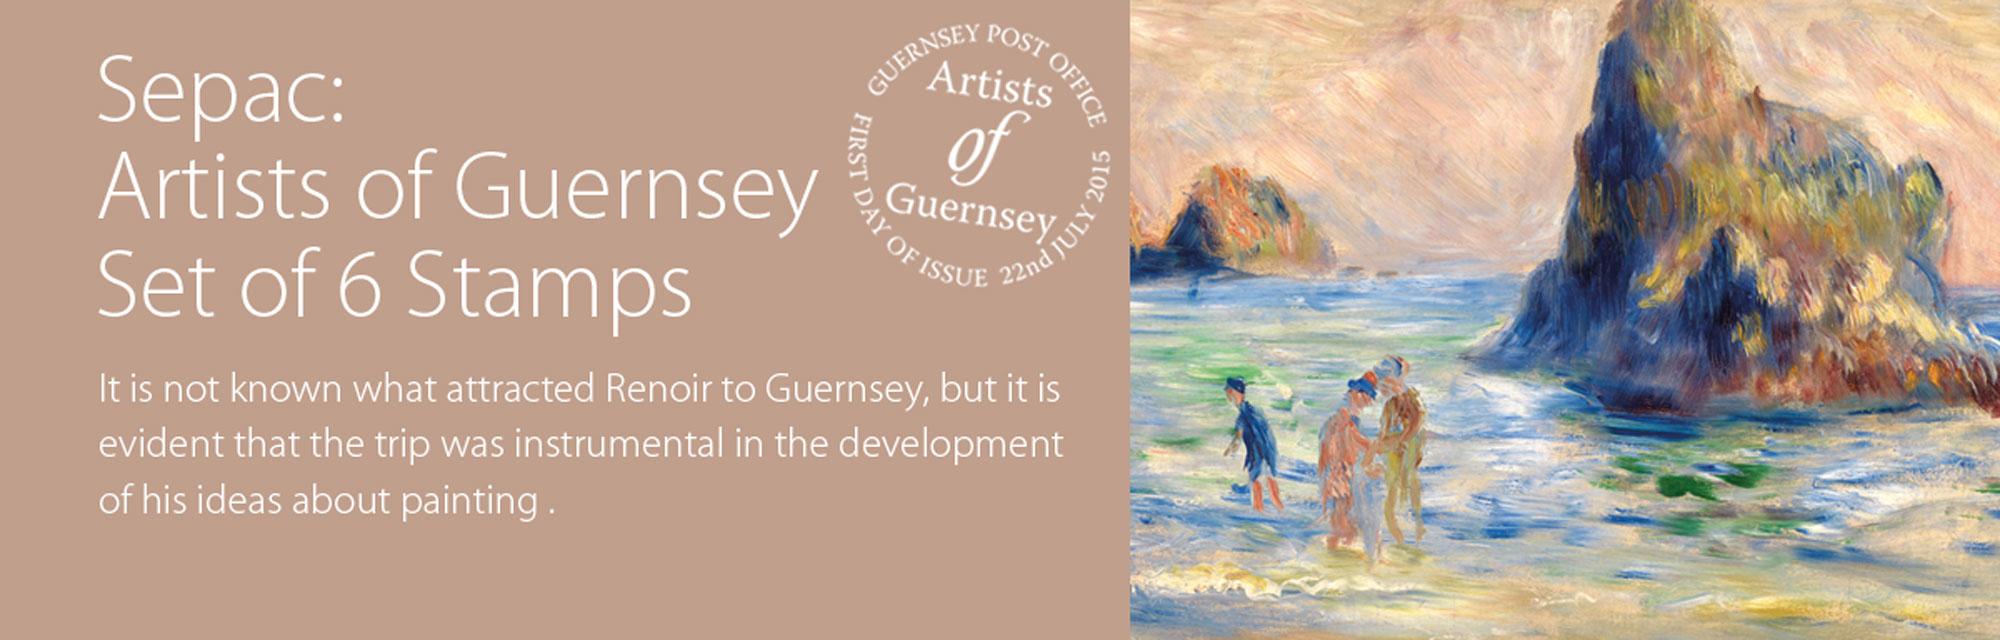 Sepac Artists of Guernsey